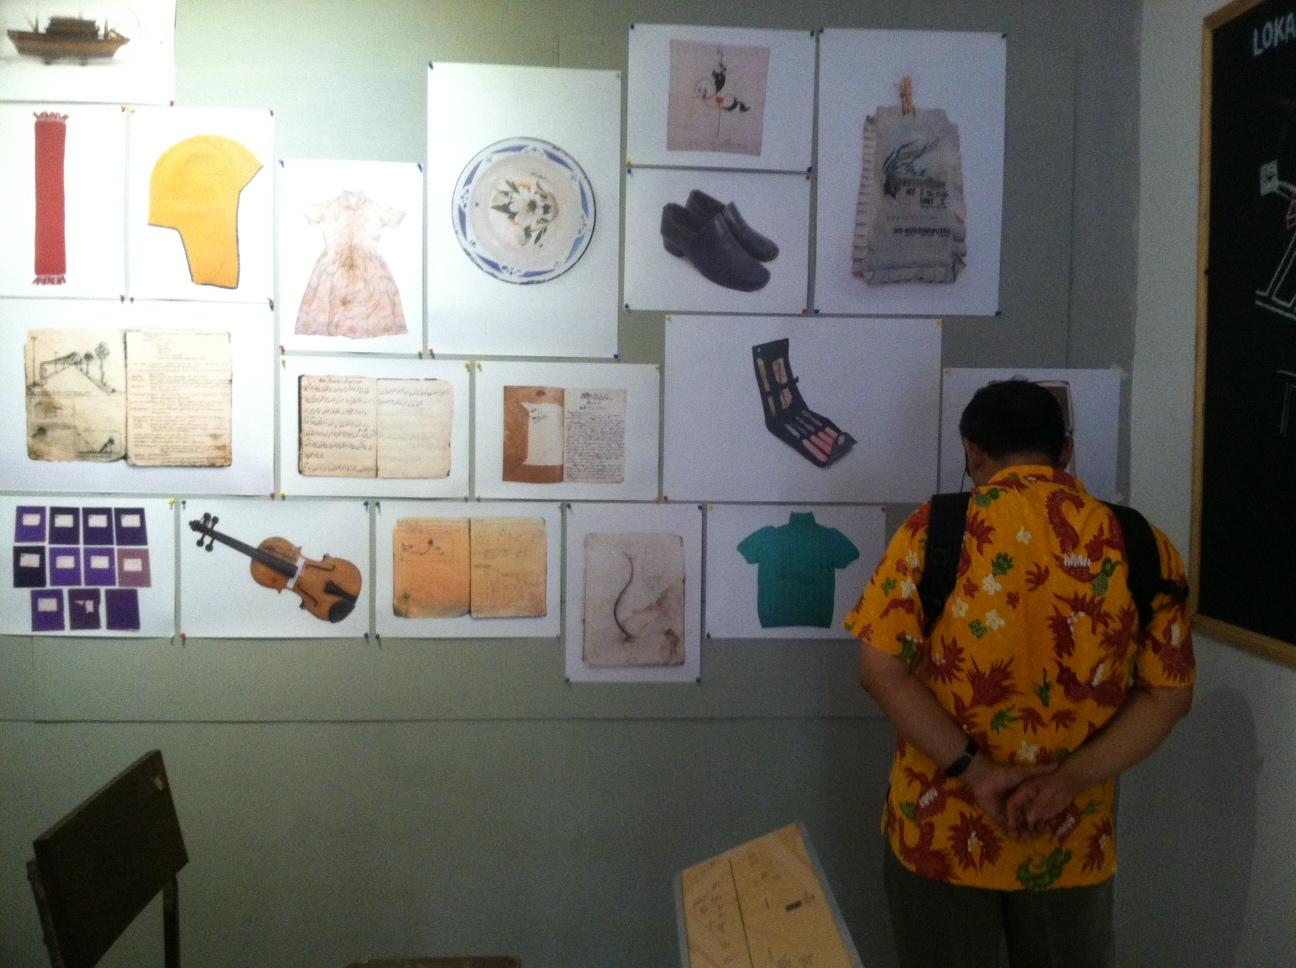 Museum Bergerak merefleksikan kerja-kerja seni dan budaya dalam kerangka melawan lupa (amnesia) bangsa Indonesia. Foto oleh Mawa Kresna/Rappler